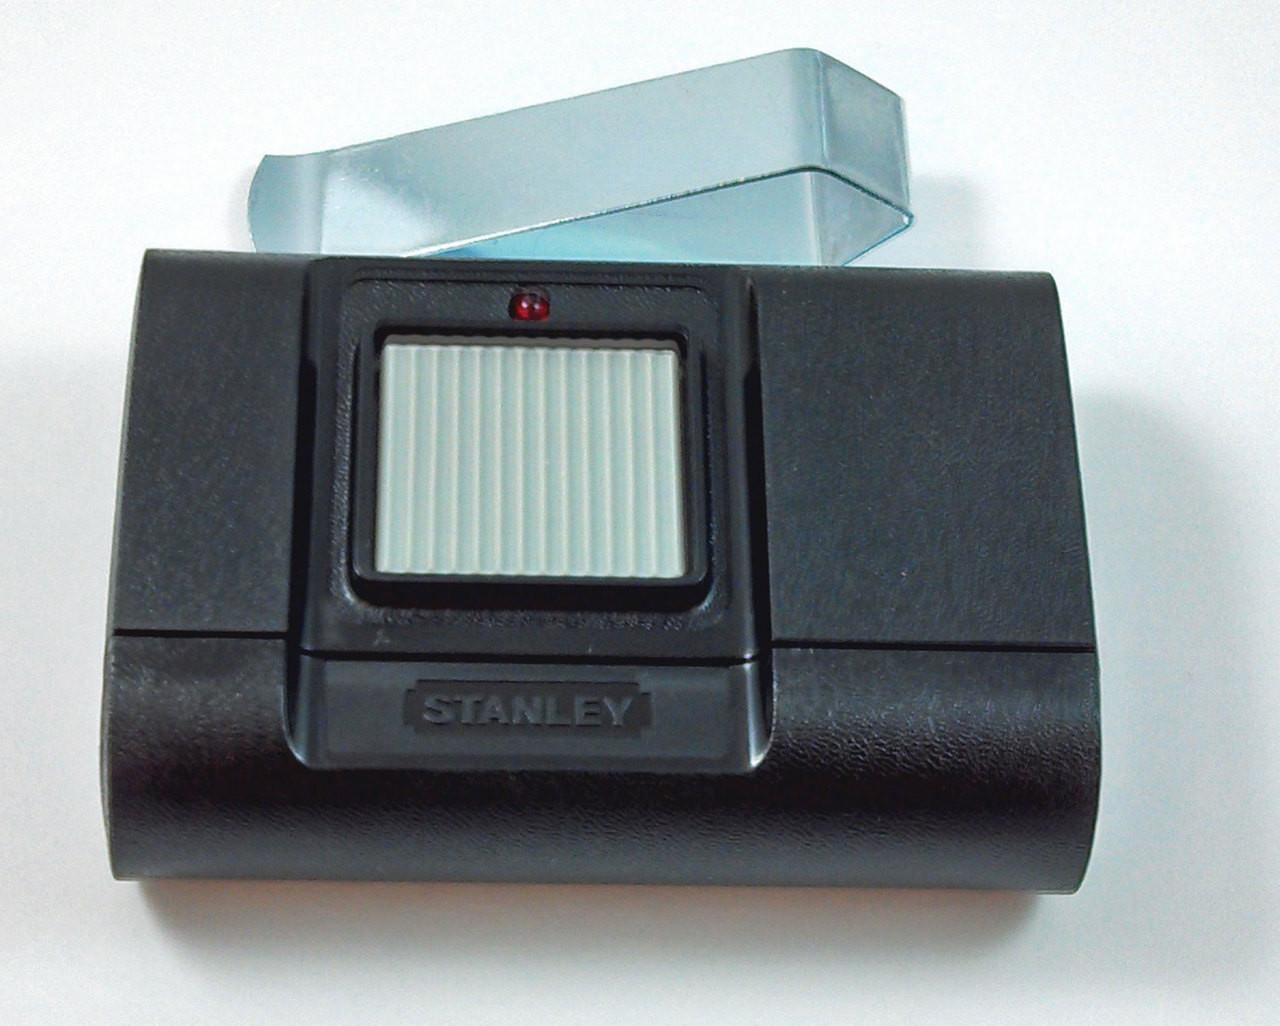 Stanley 1082 Compat Garage Door Remote Stanley 1050 1047 1044 1037 Transmitter